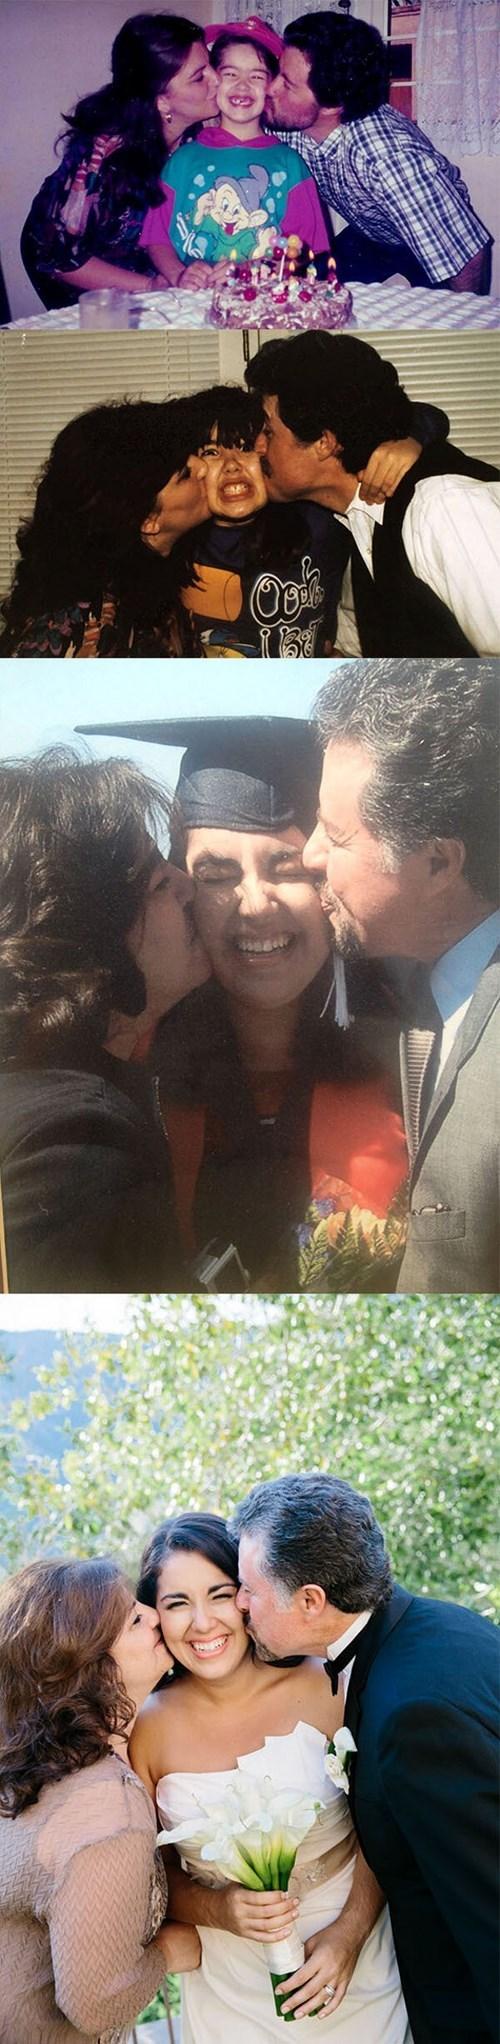 kids kisses growing up parenting - 8323207424